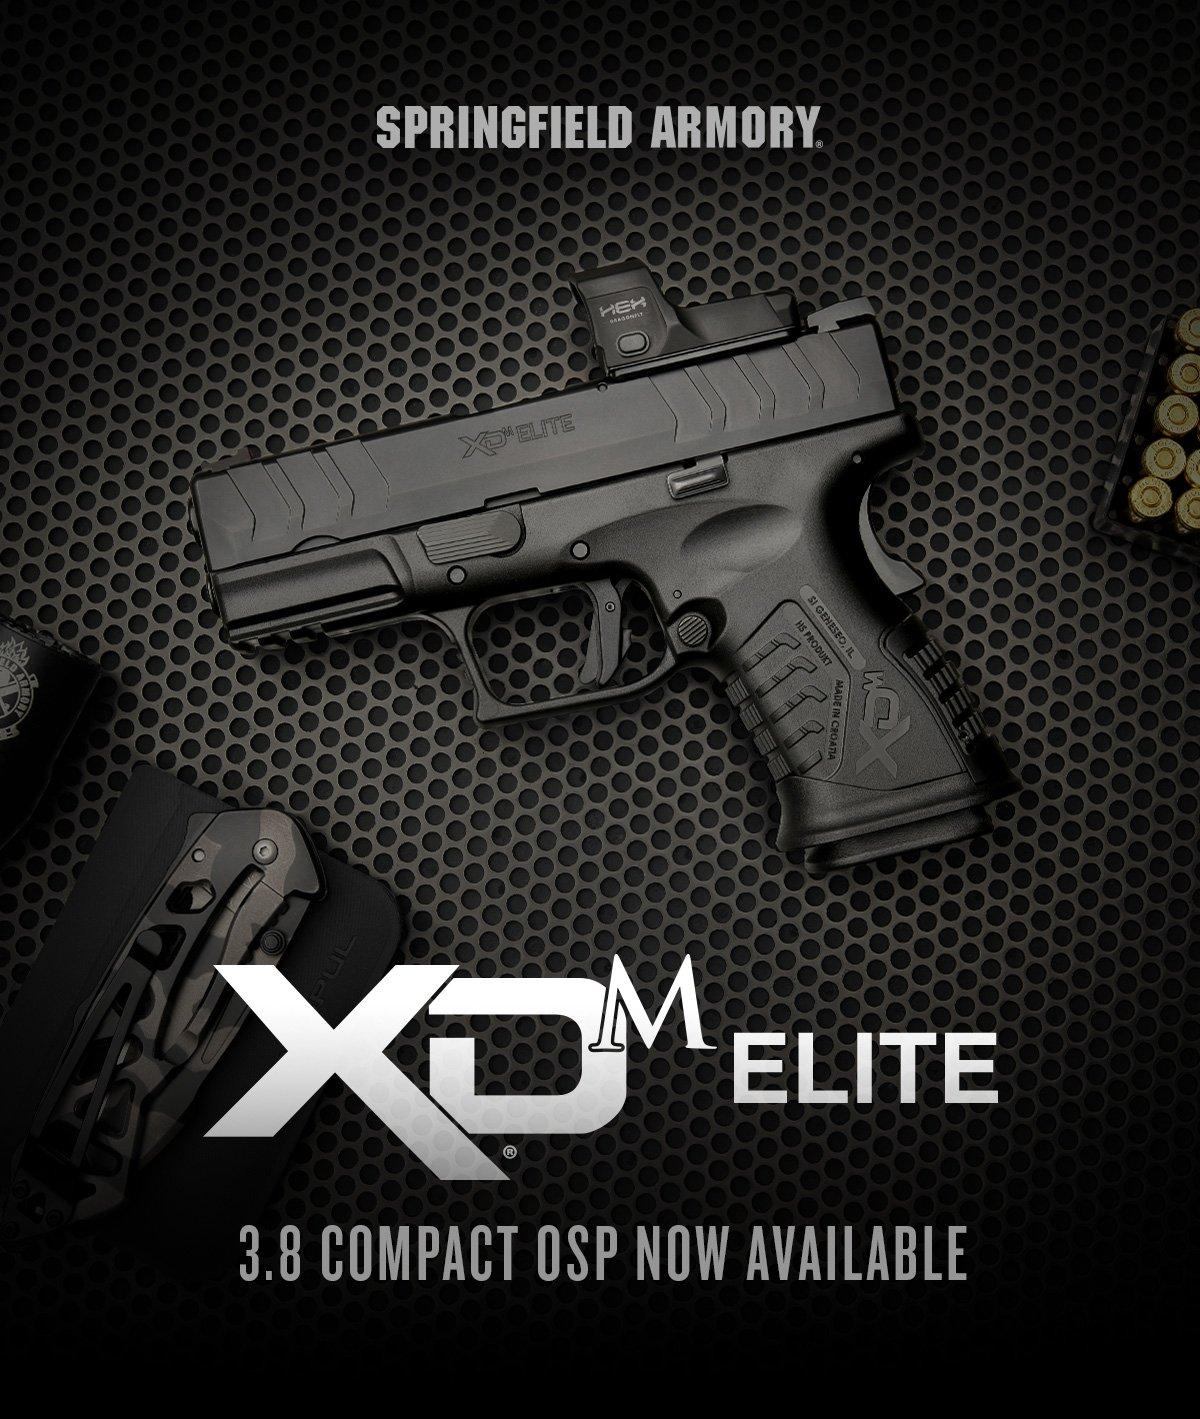 xdm-elite-compact-osp-header-2